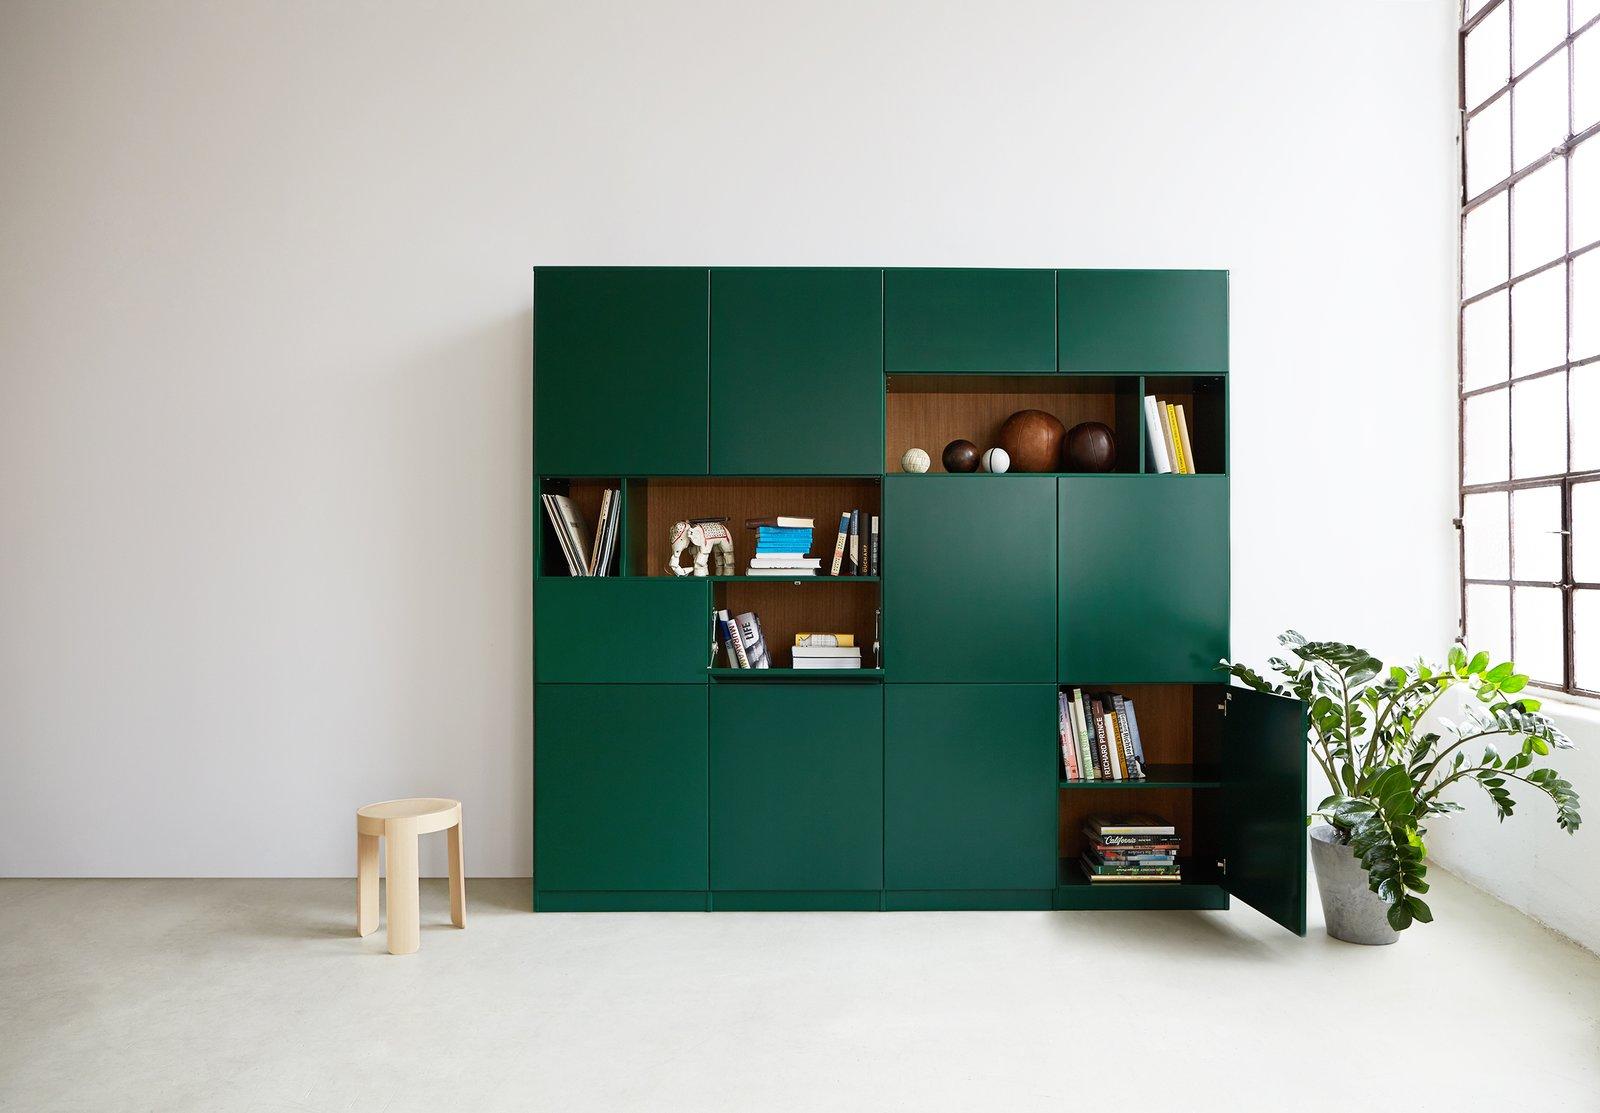 Hem customizable cabinet Shape-Shifters: Modular Furniture by Heather Corcoran